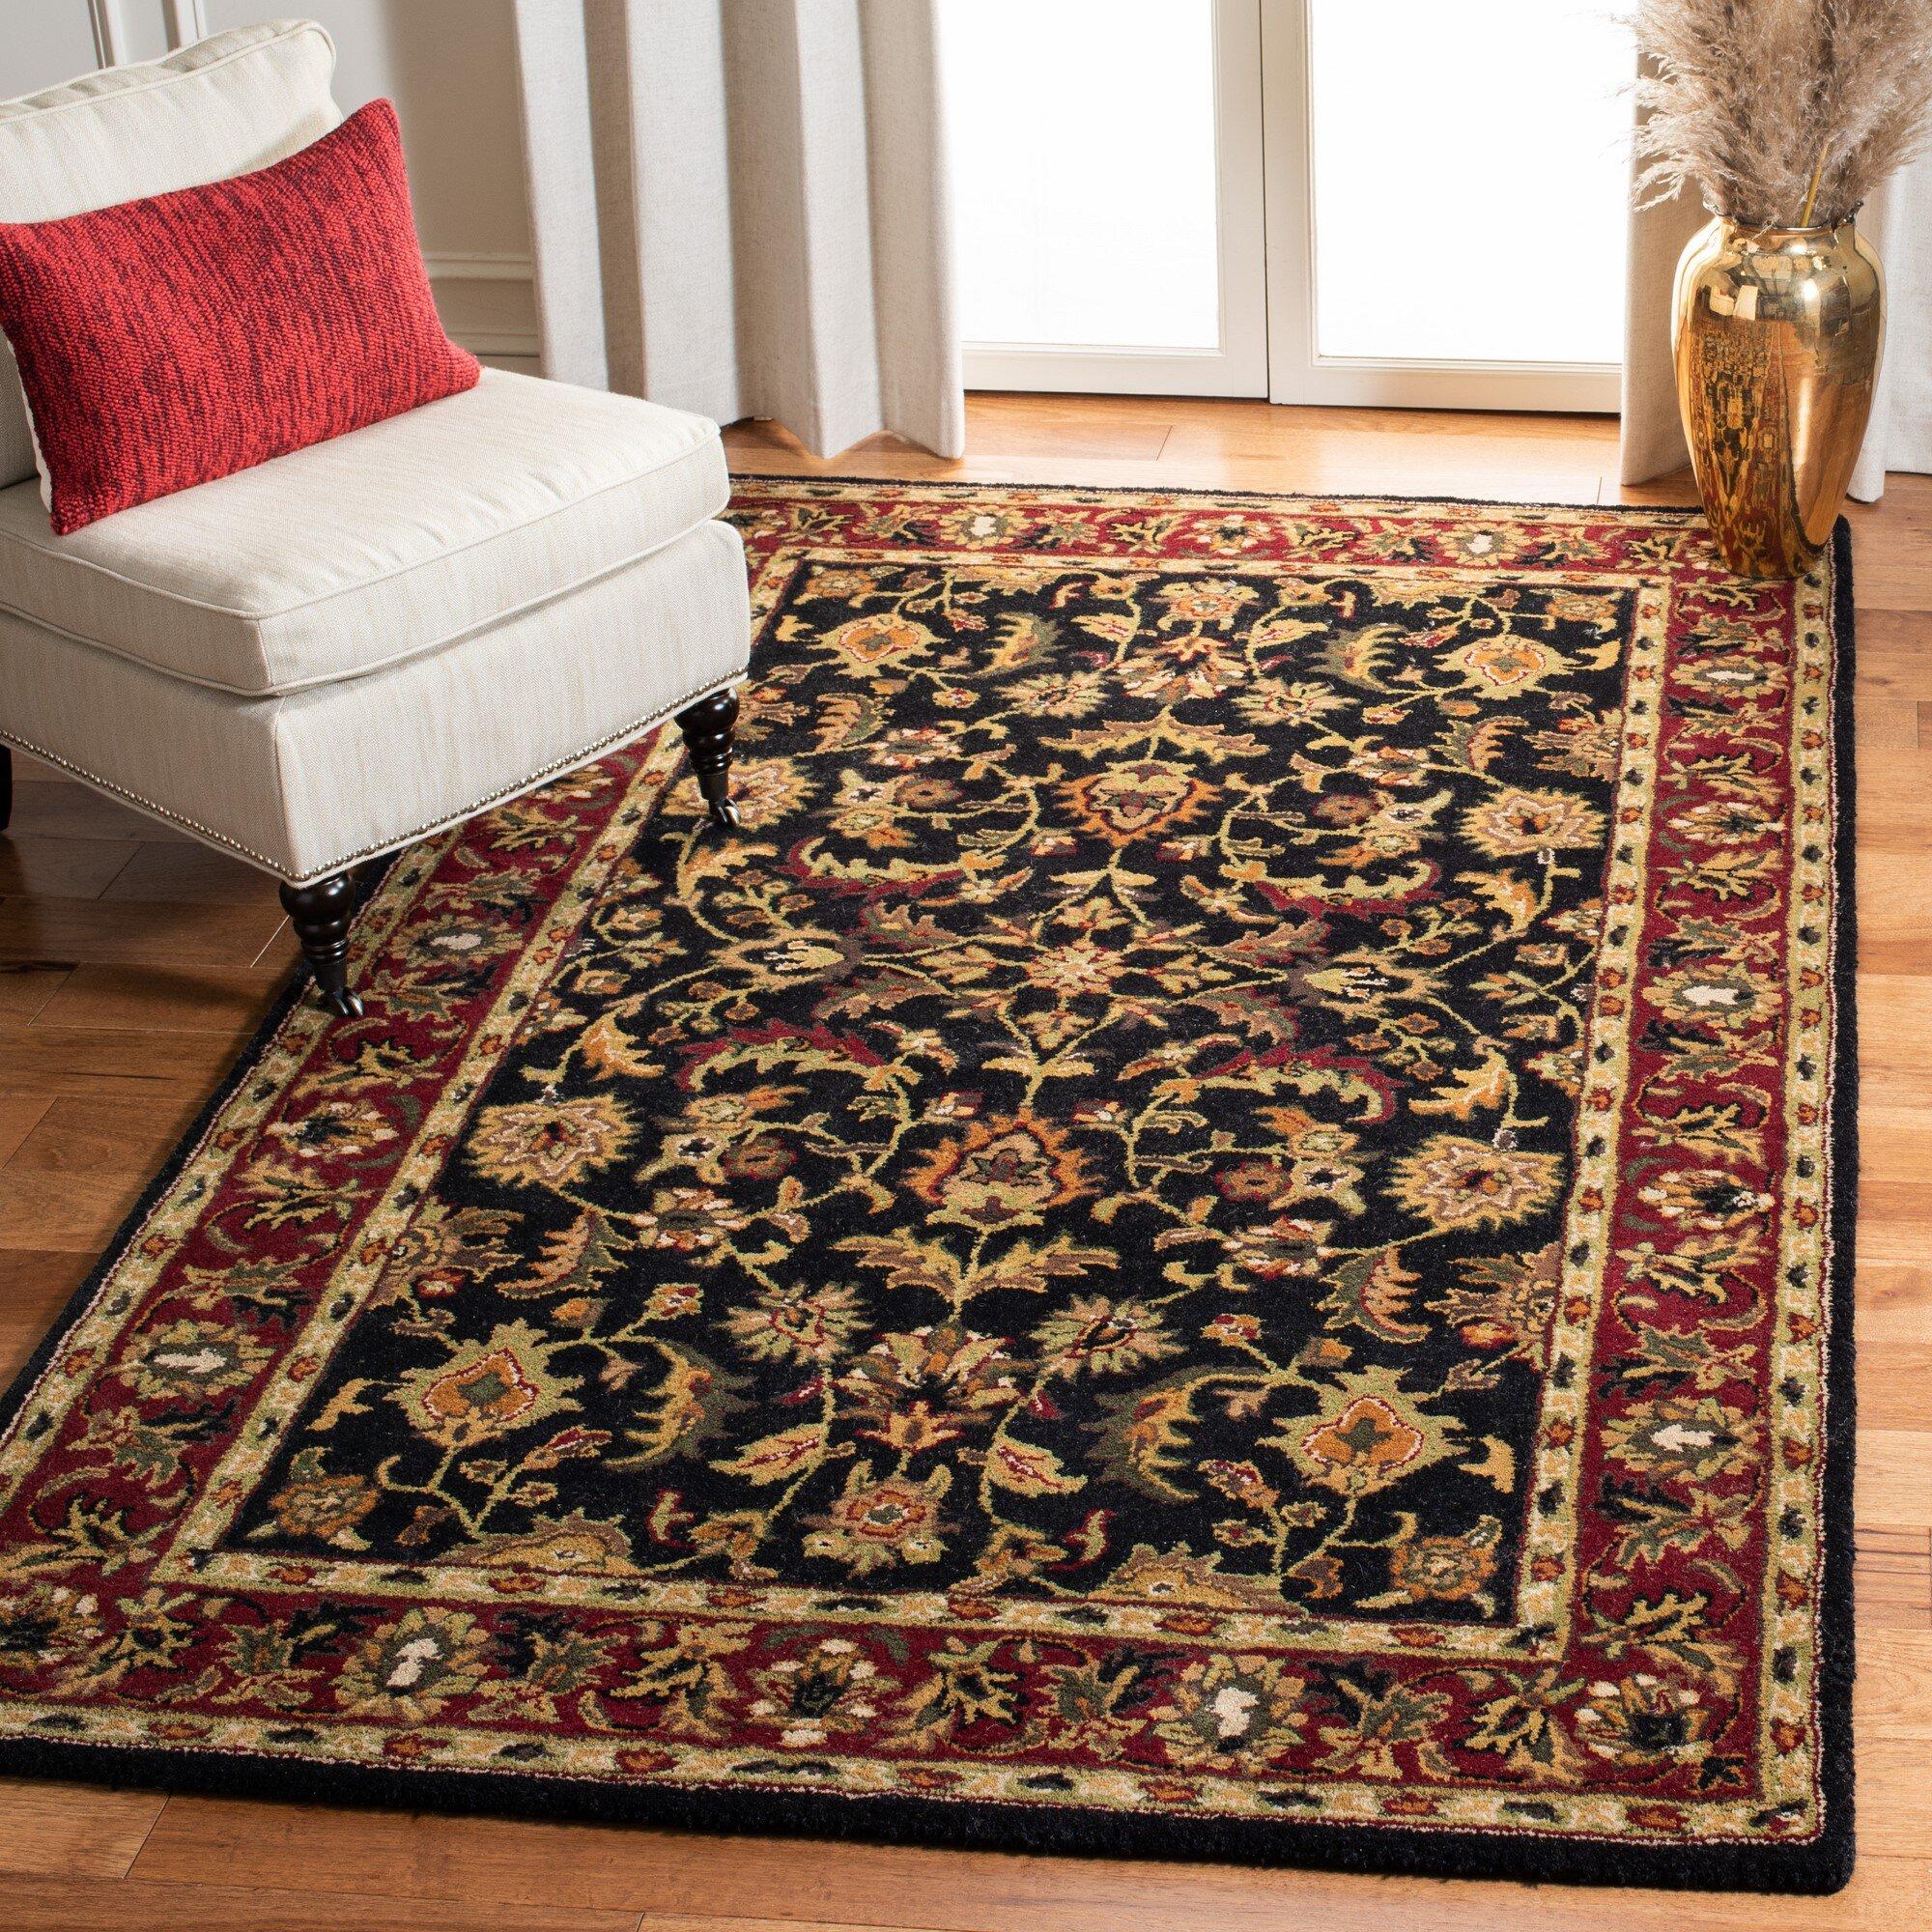 Charlton Home Cranmore Oriental Handmade Tufted Wool Black Red Area Rug Reviews Wayfair